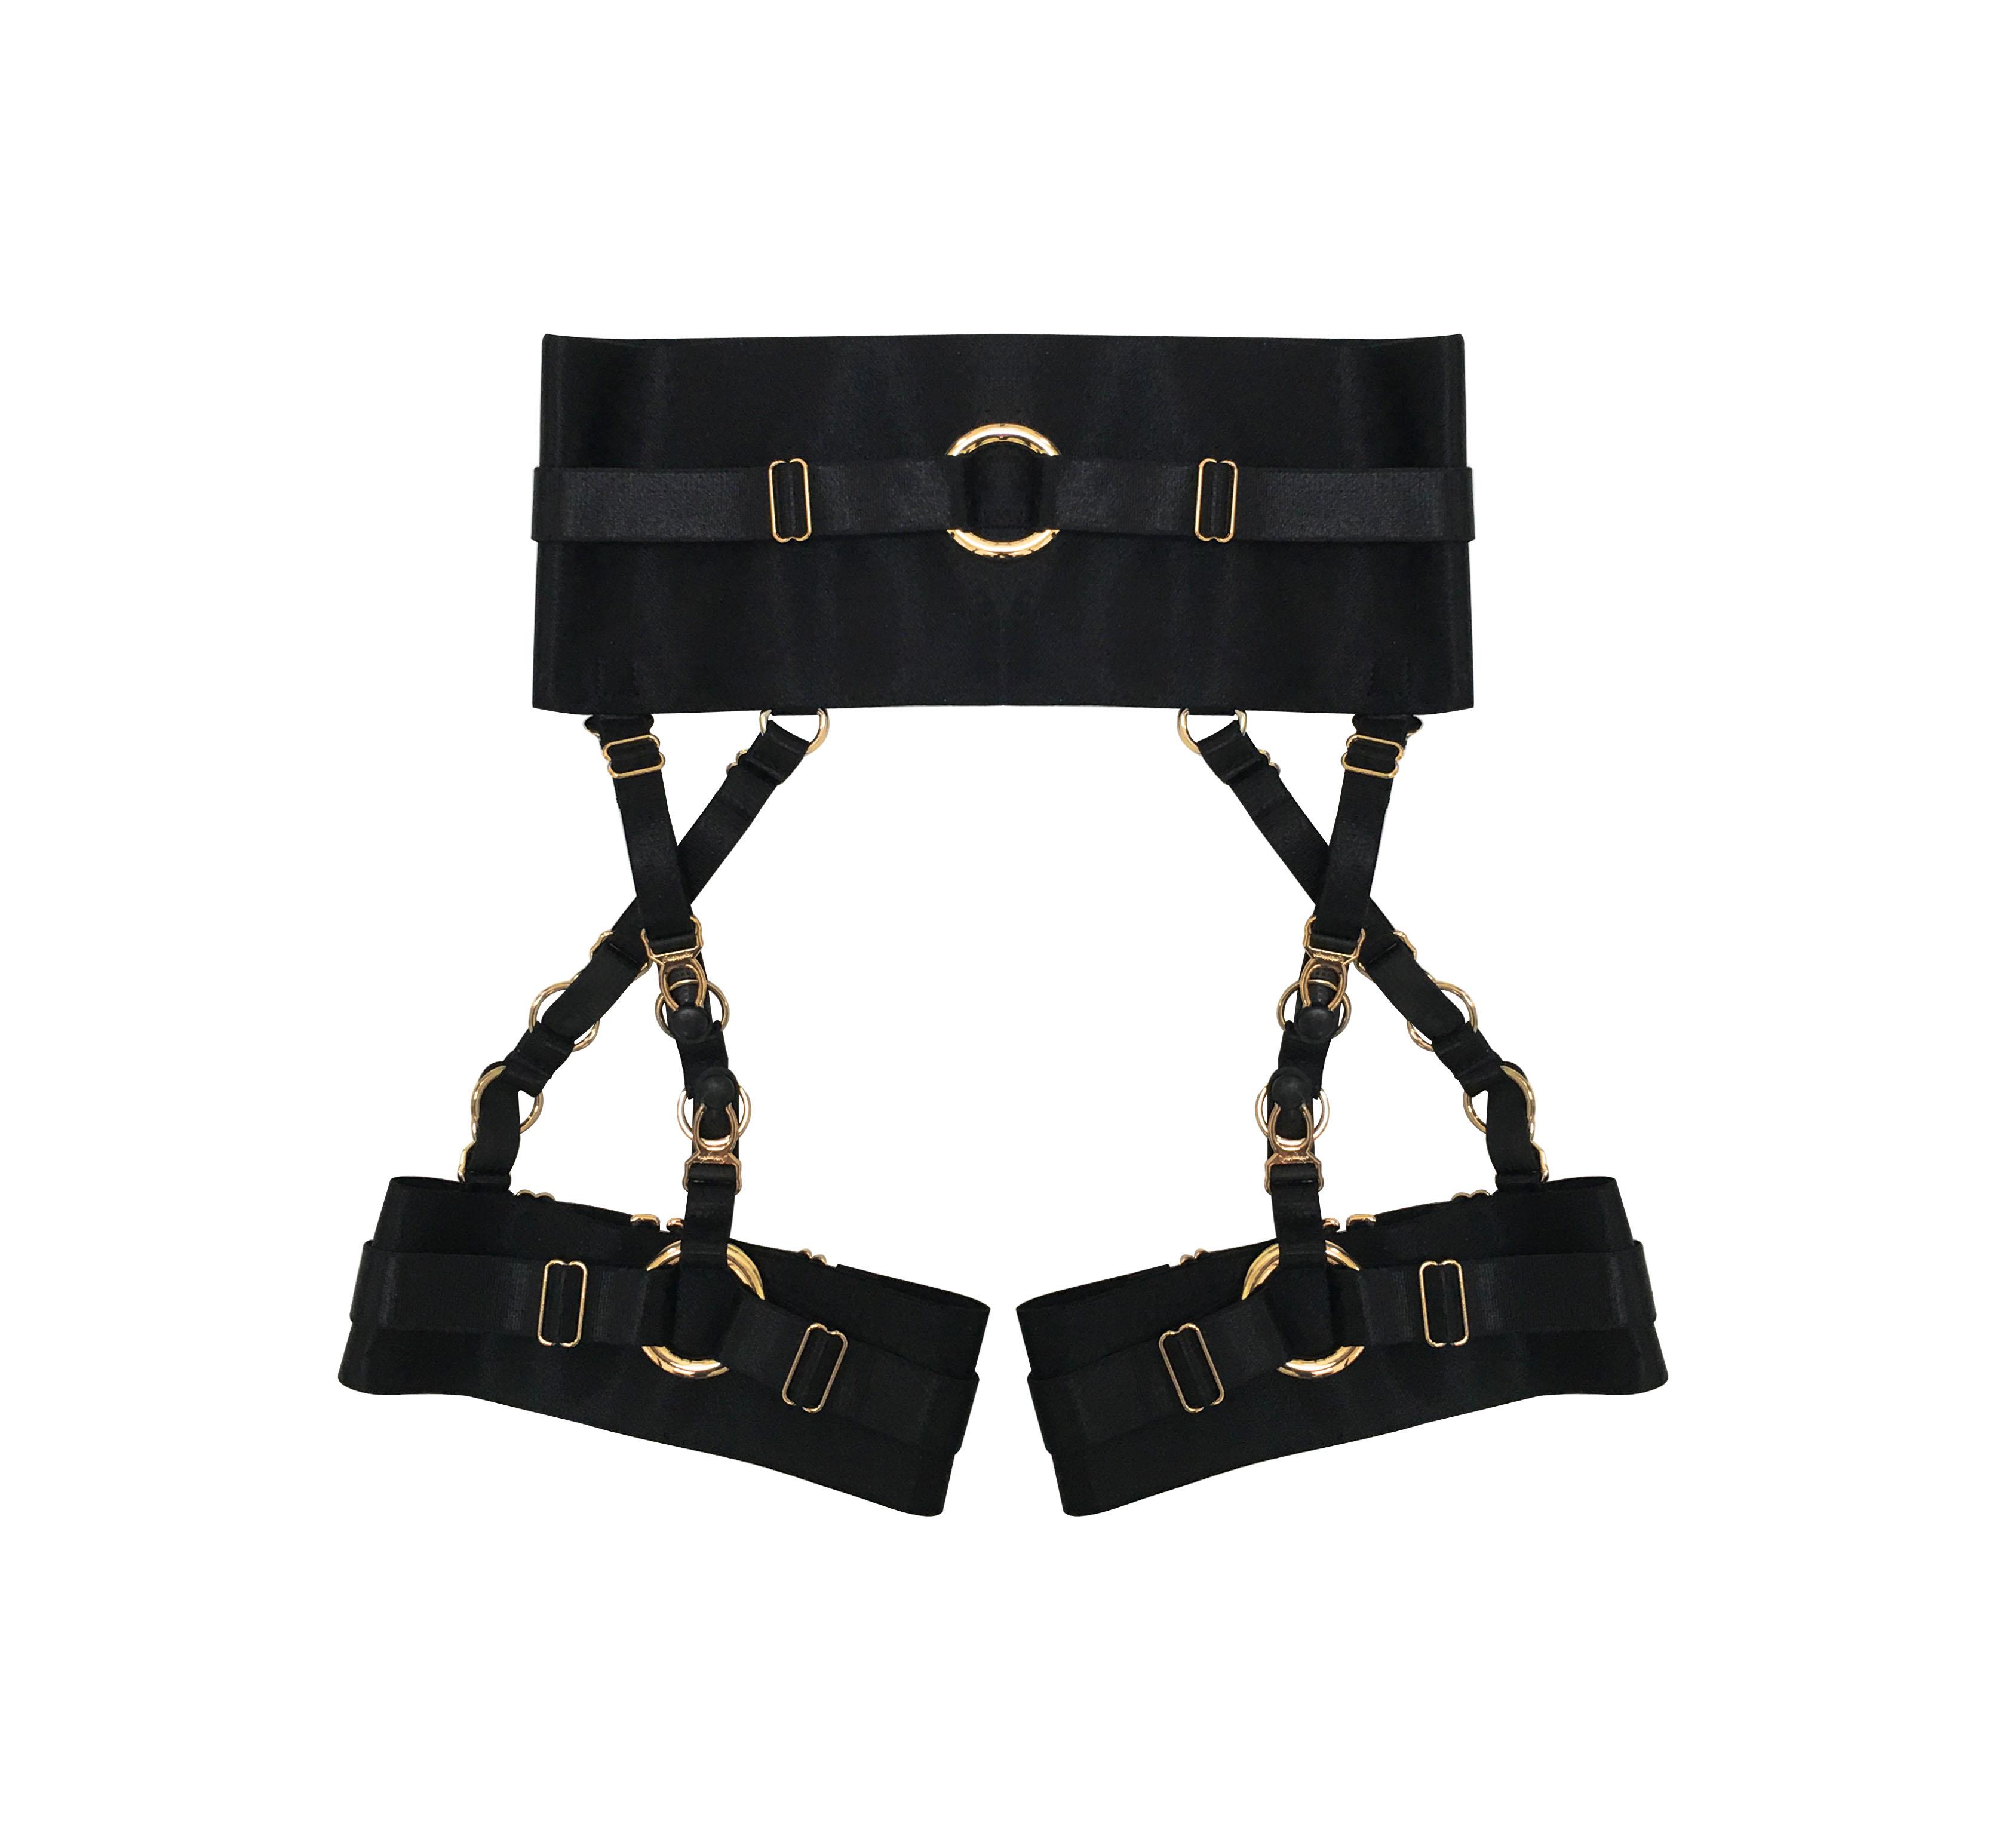 95ff1655b Fenti Garter Belt ( Black + Gold ) · CREEPYYEHA · Online Store ...